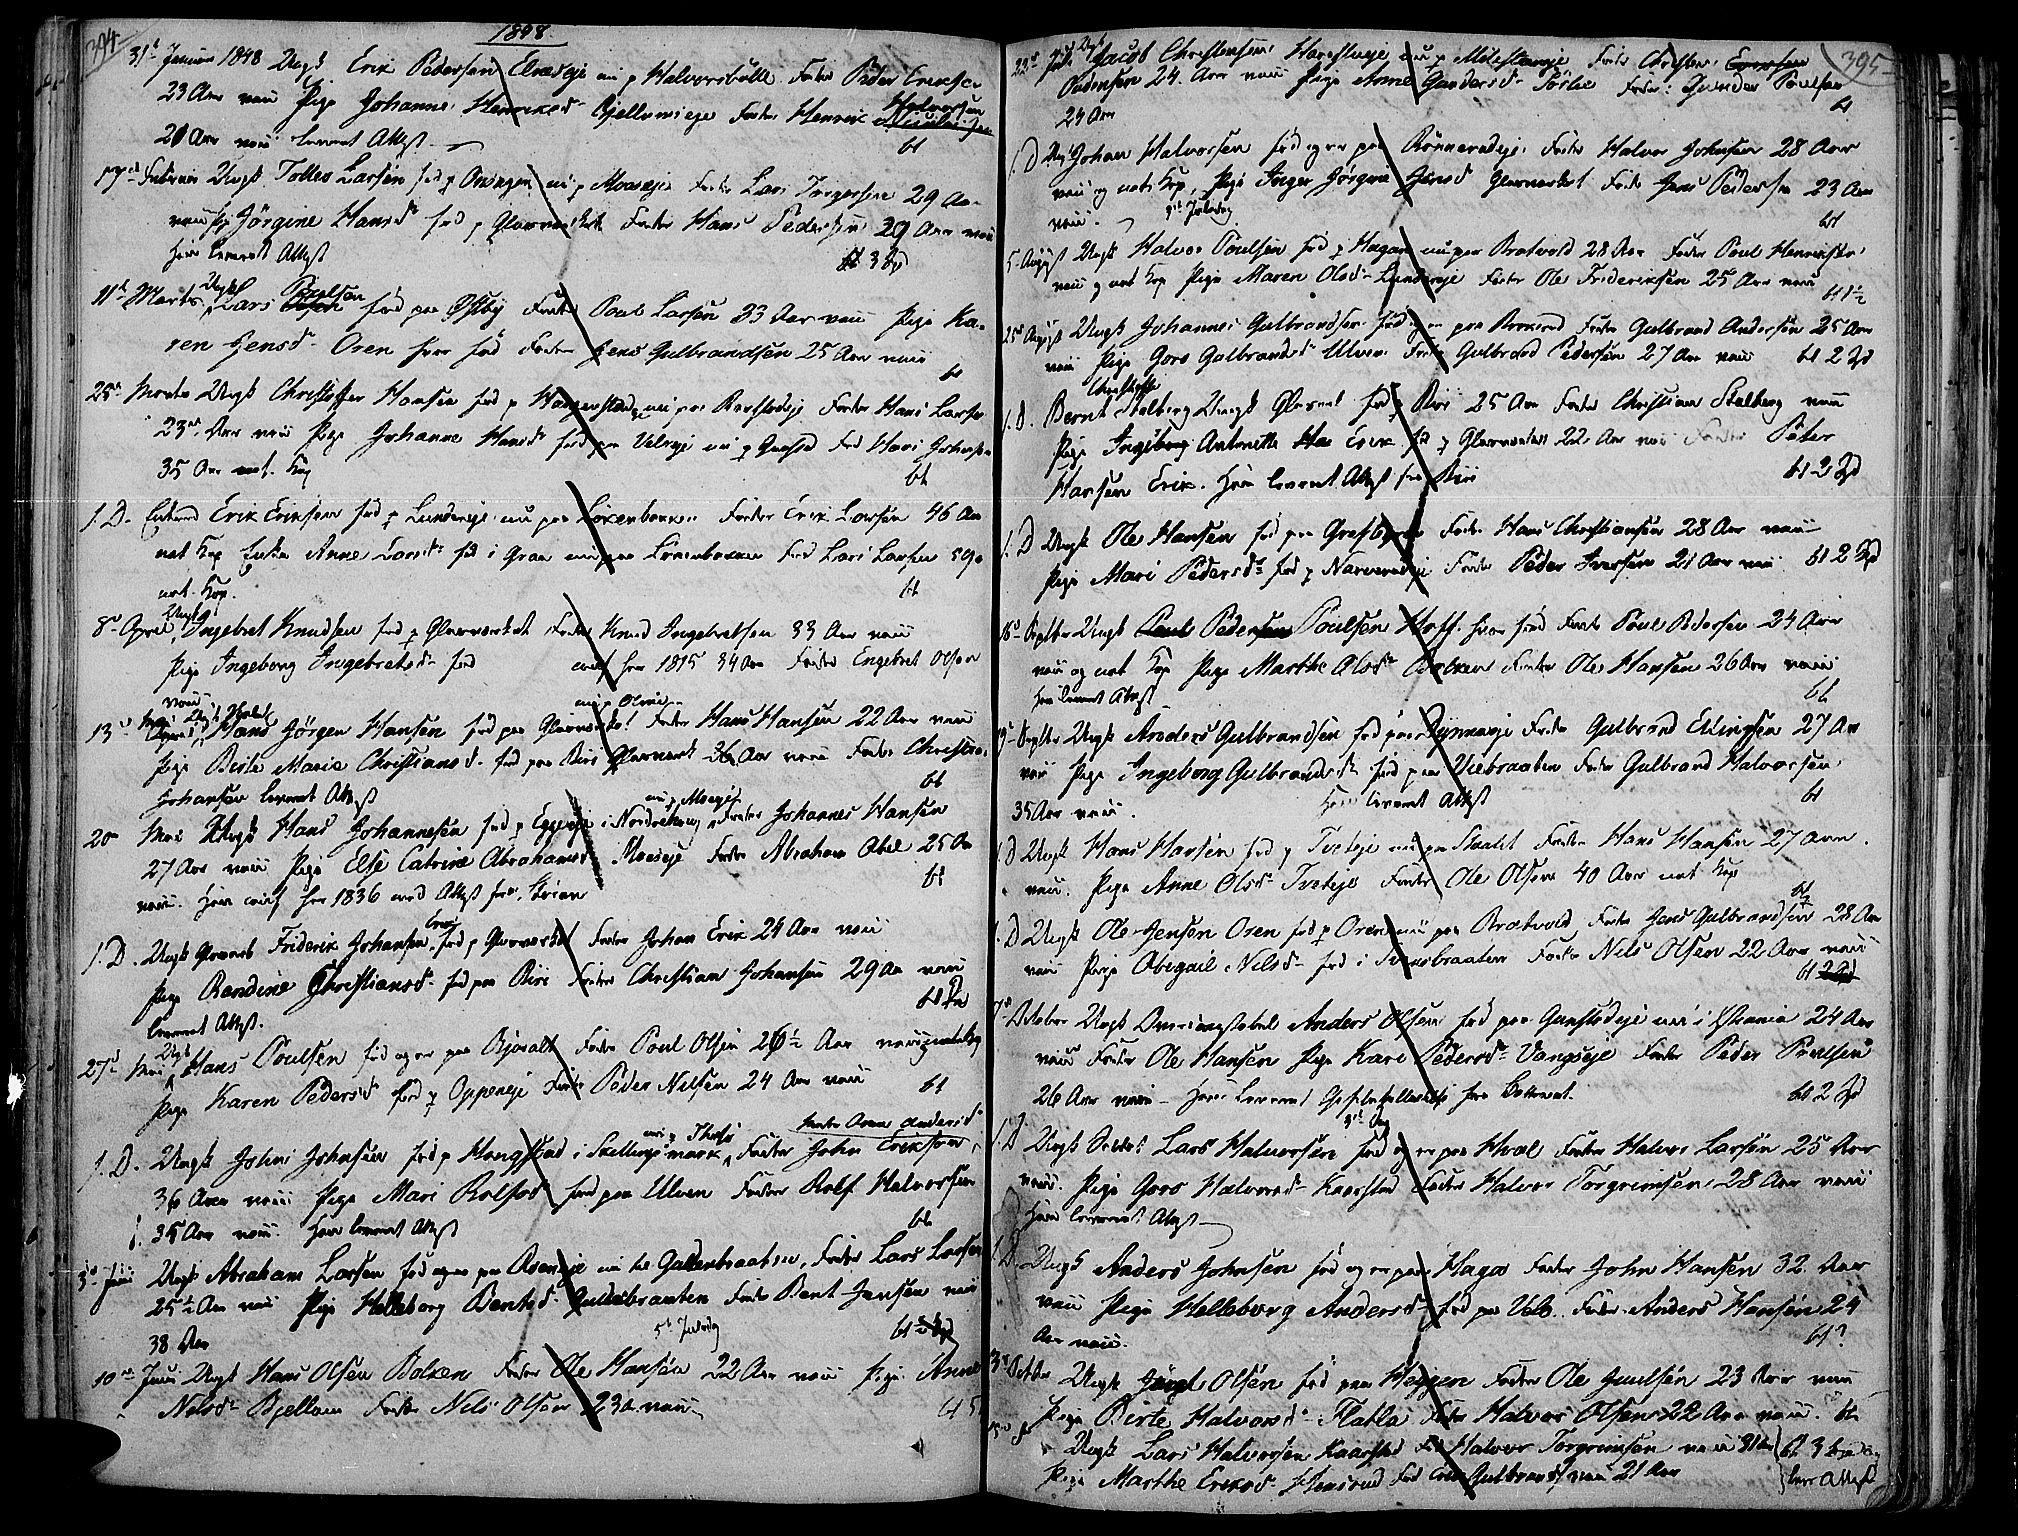 SAH, Jevnaker prestekontor, Ministerialbok nr. 4, 1800-1861, s. 394-395